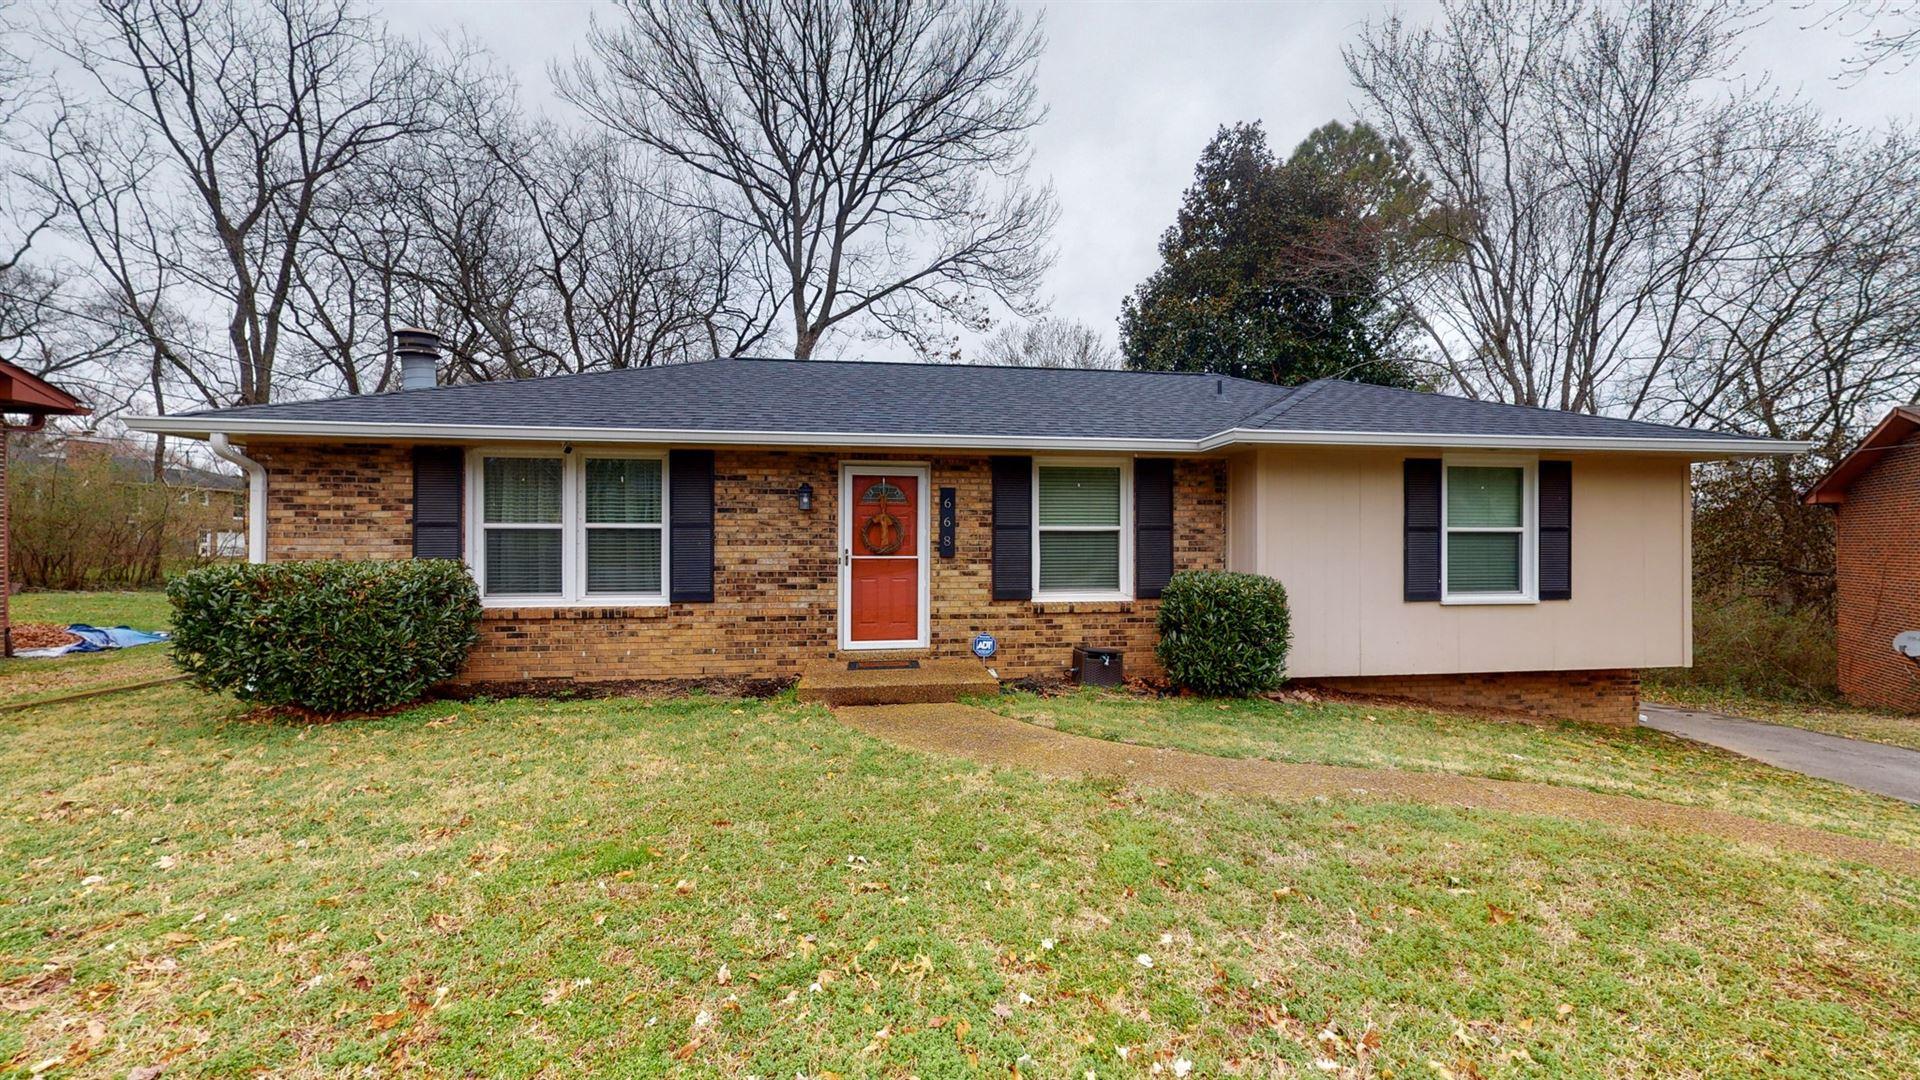 668 Huntington Ridge Dr, Nashville, TN 37211 - MLS#: 2232535